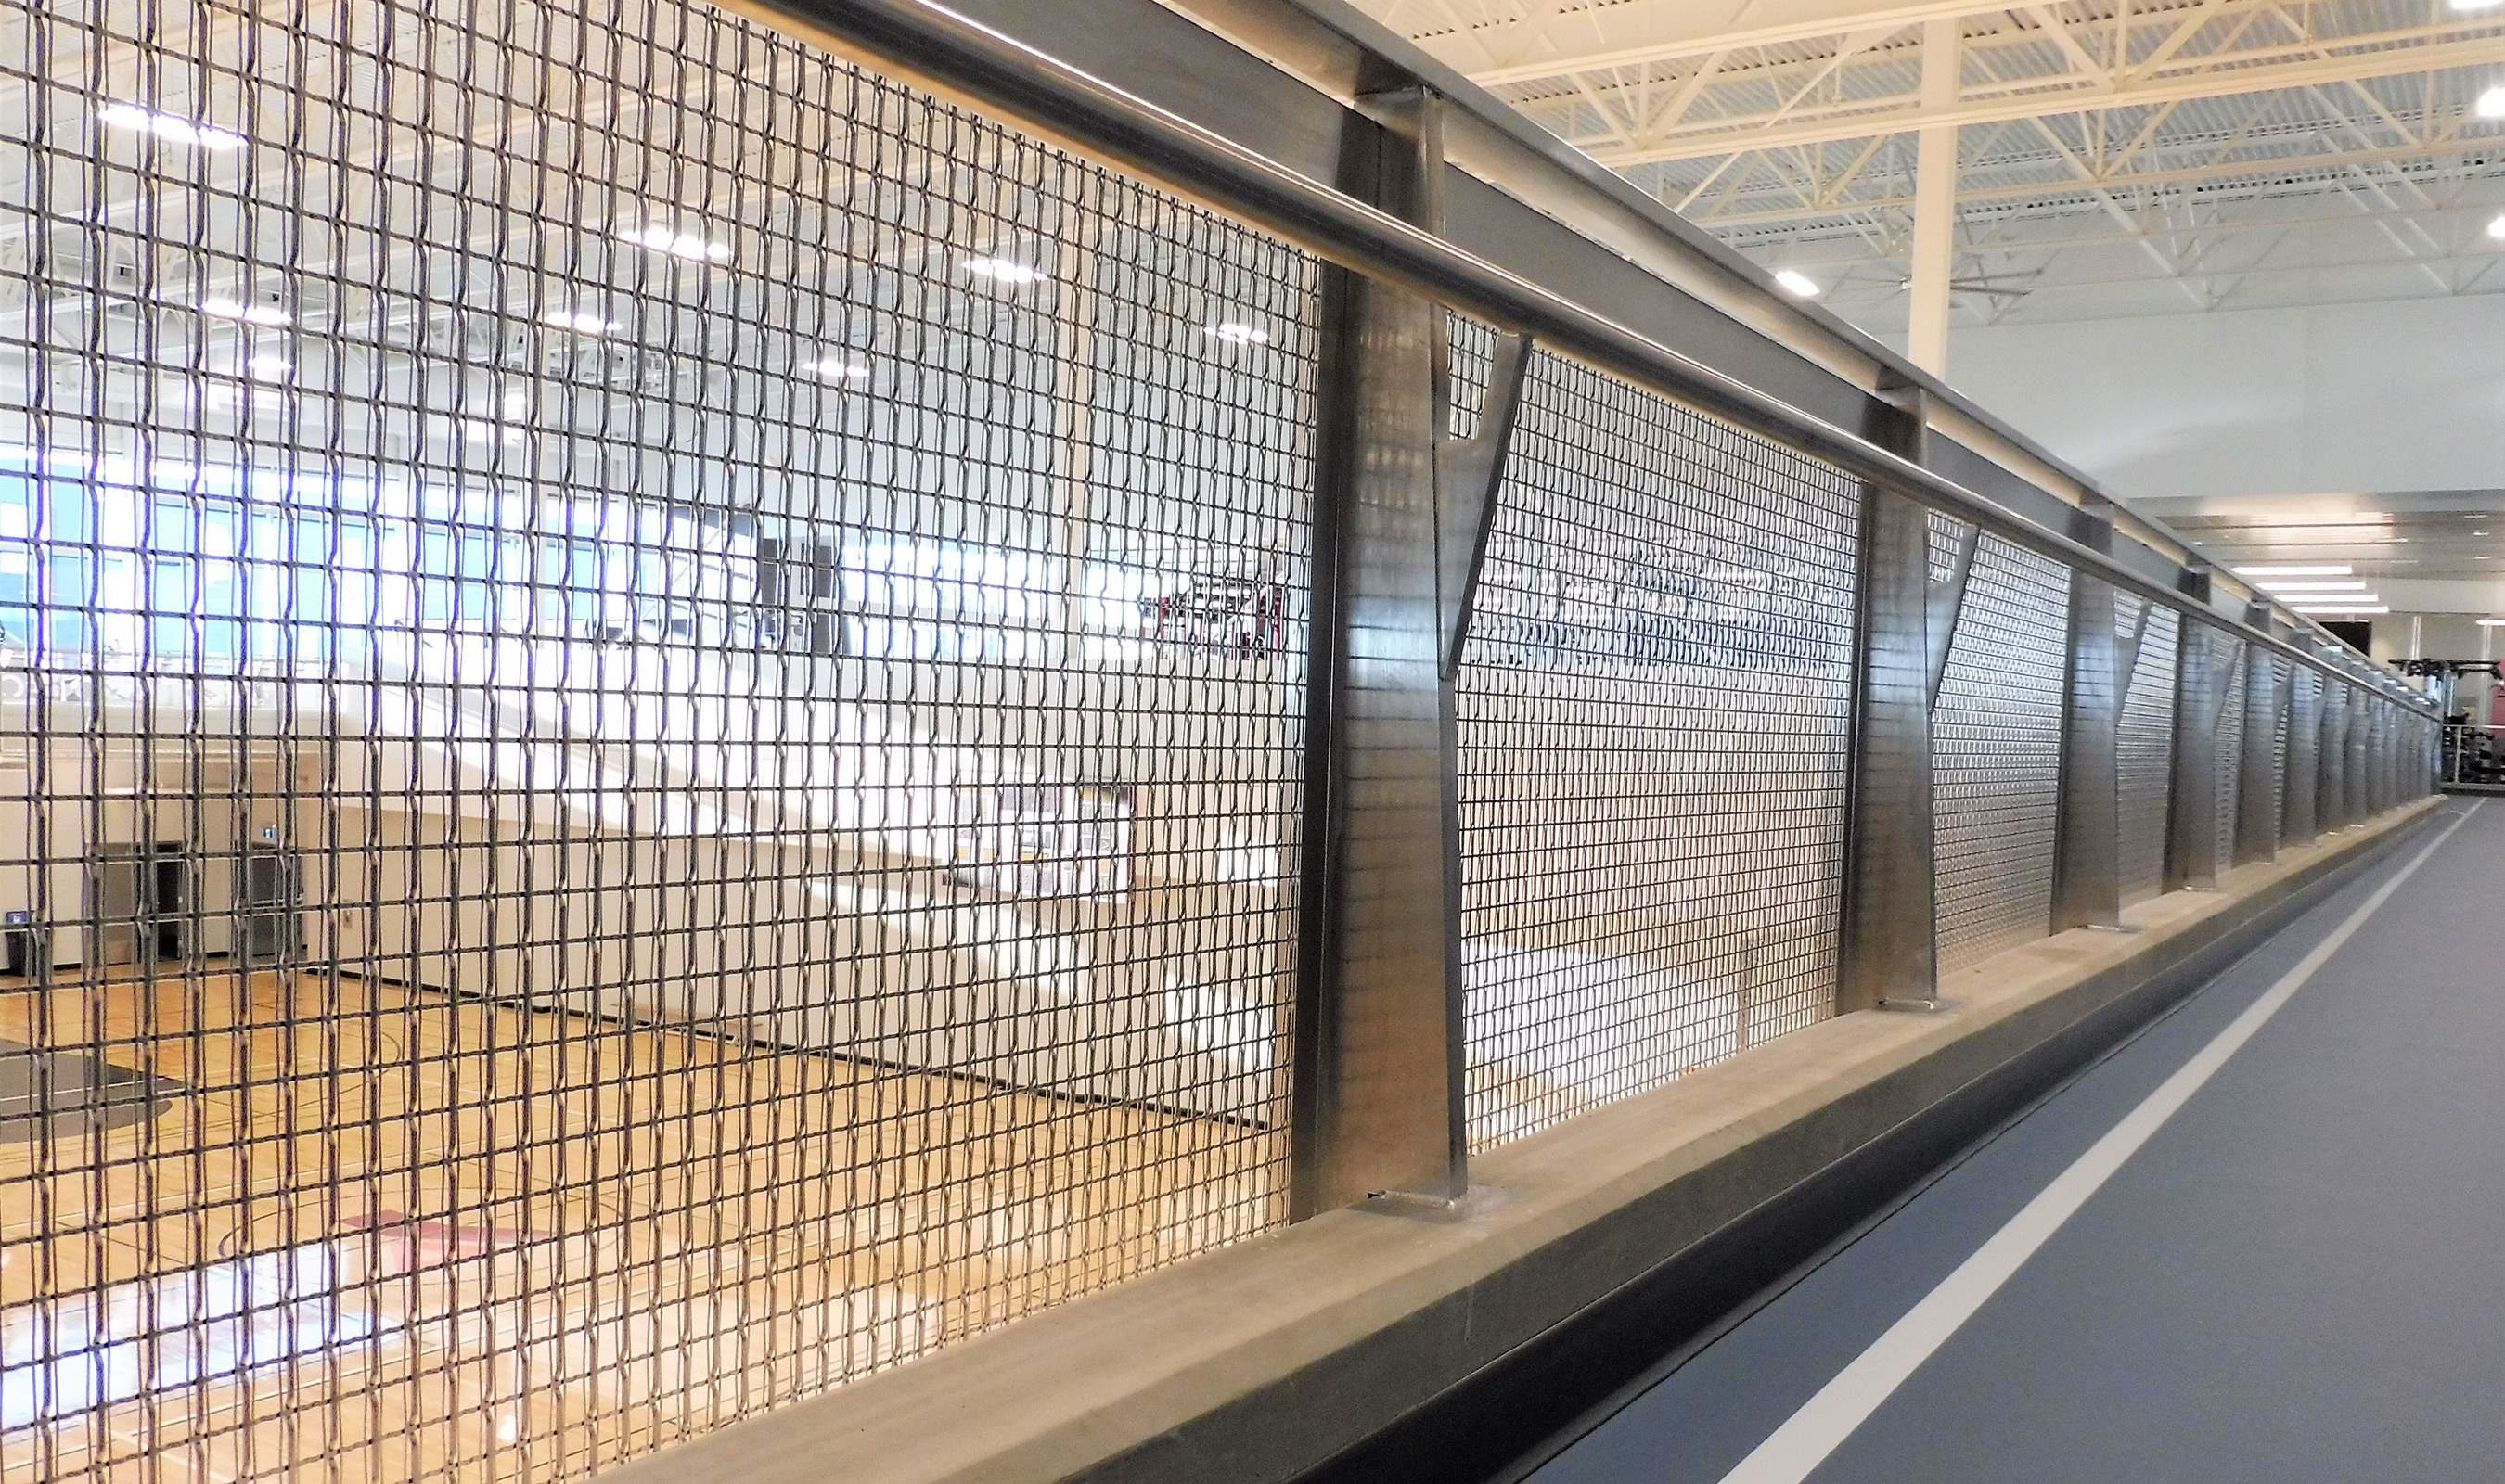 SJD-7 SS Railing infill panels